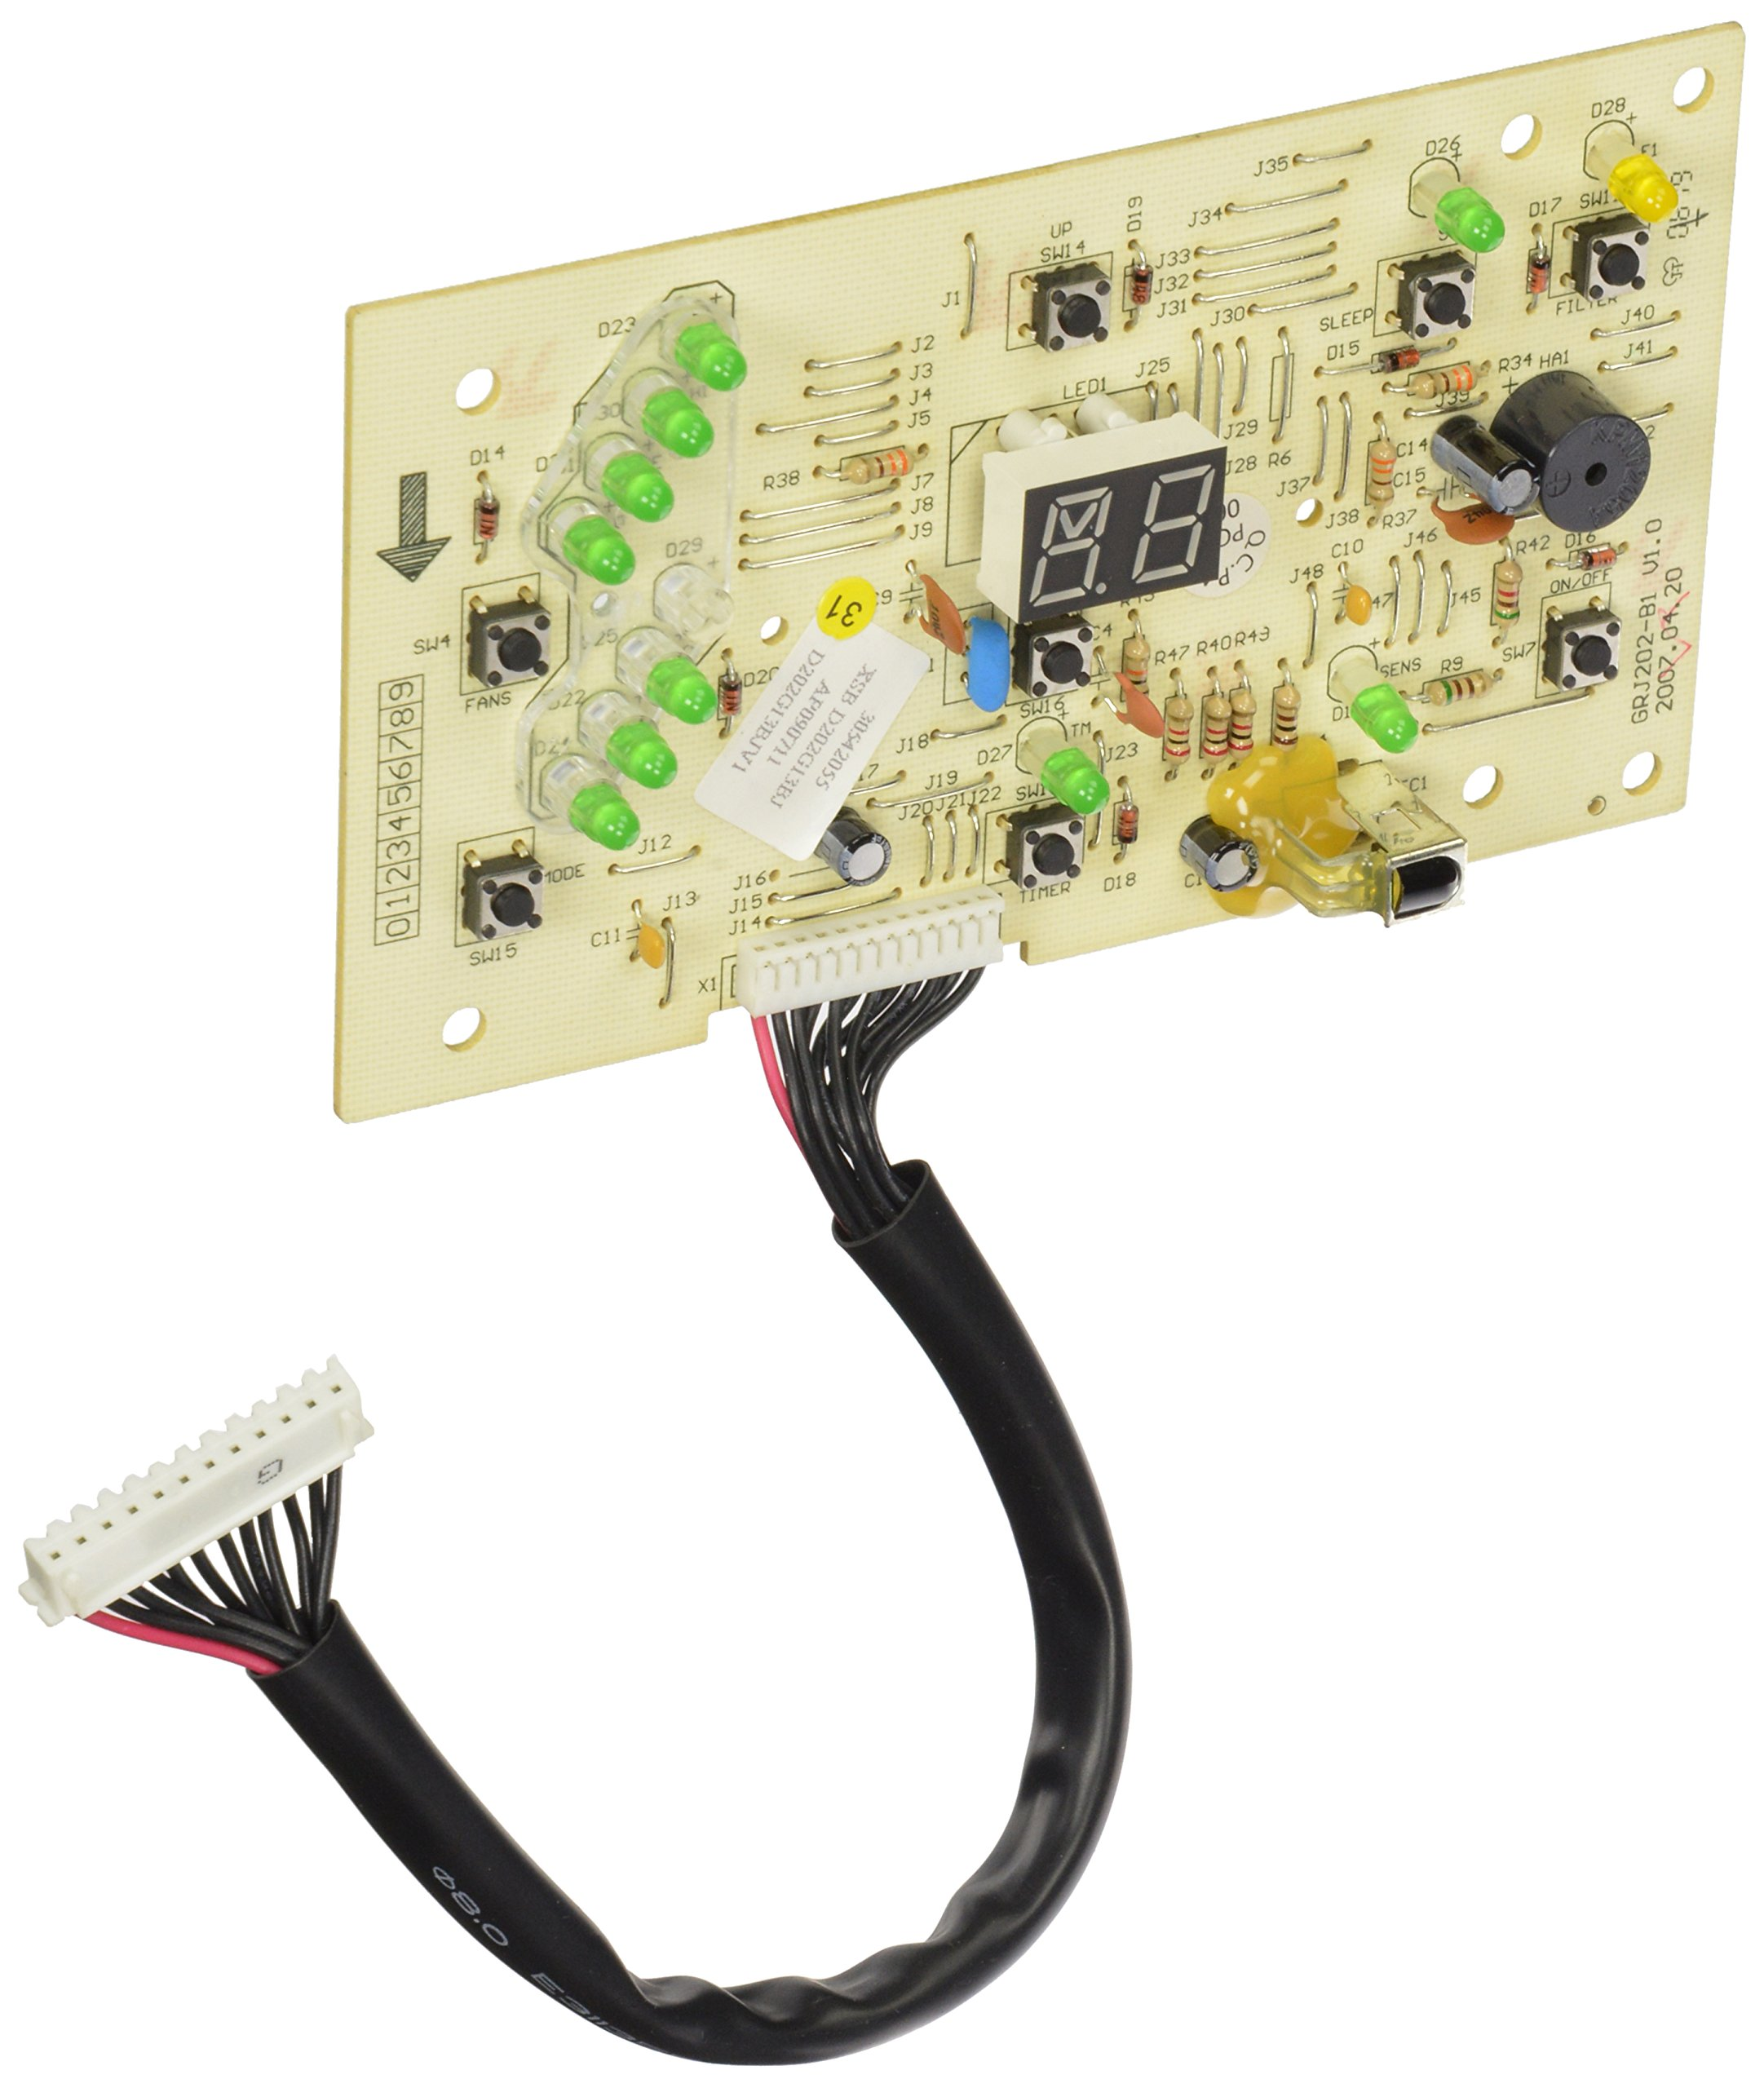 Frigidaire 5304467094 Air Conditioner Main Control Board by Frigidaire